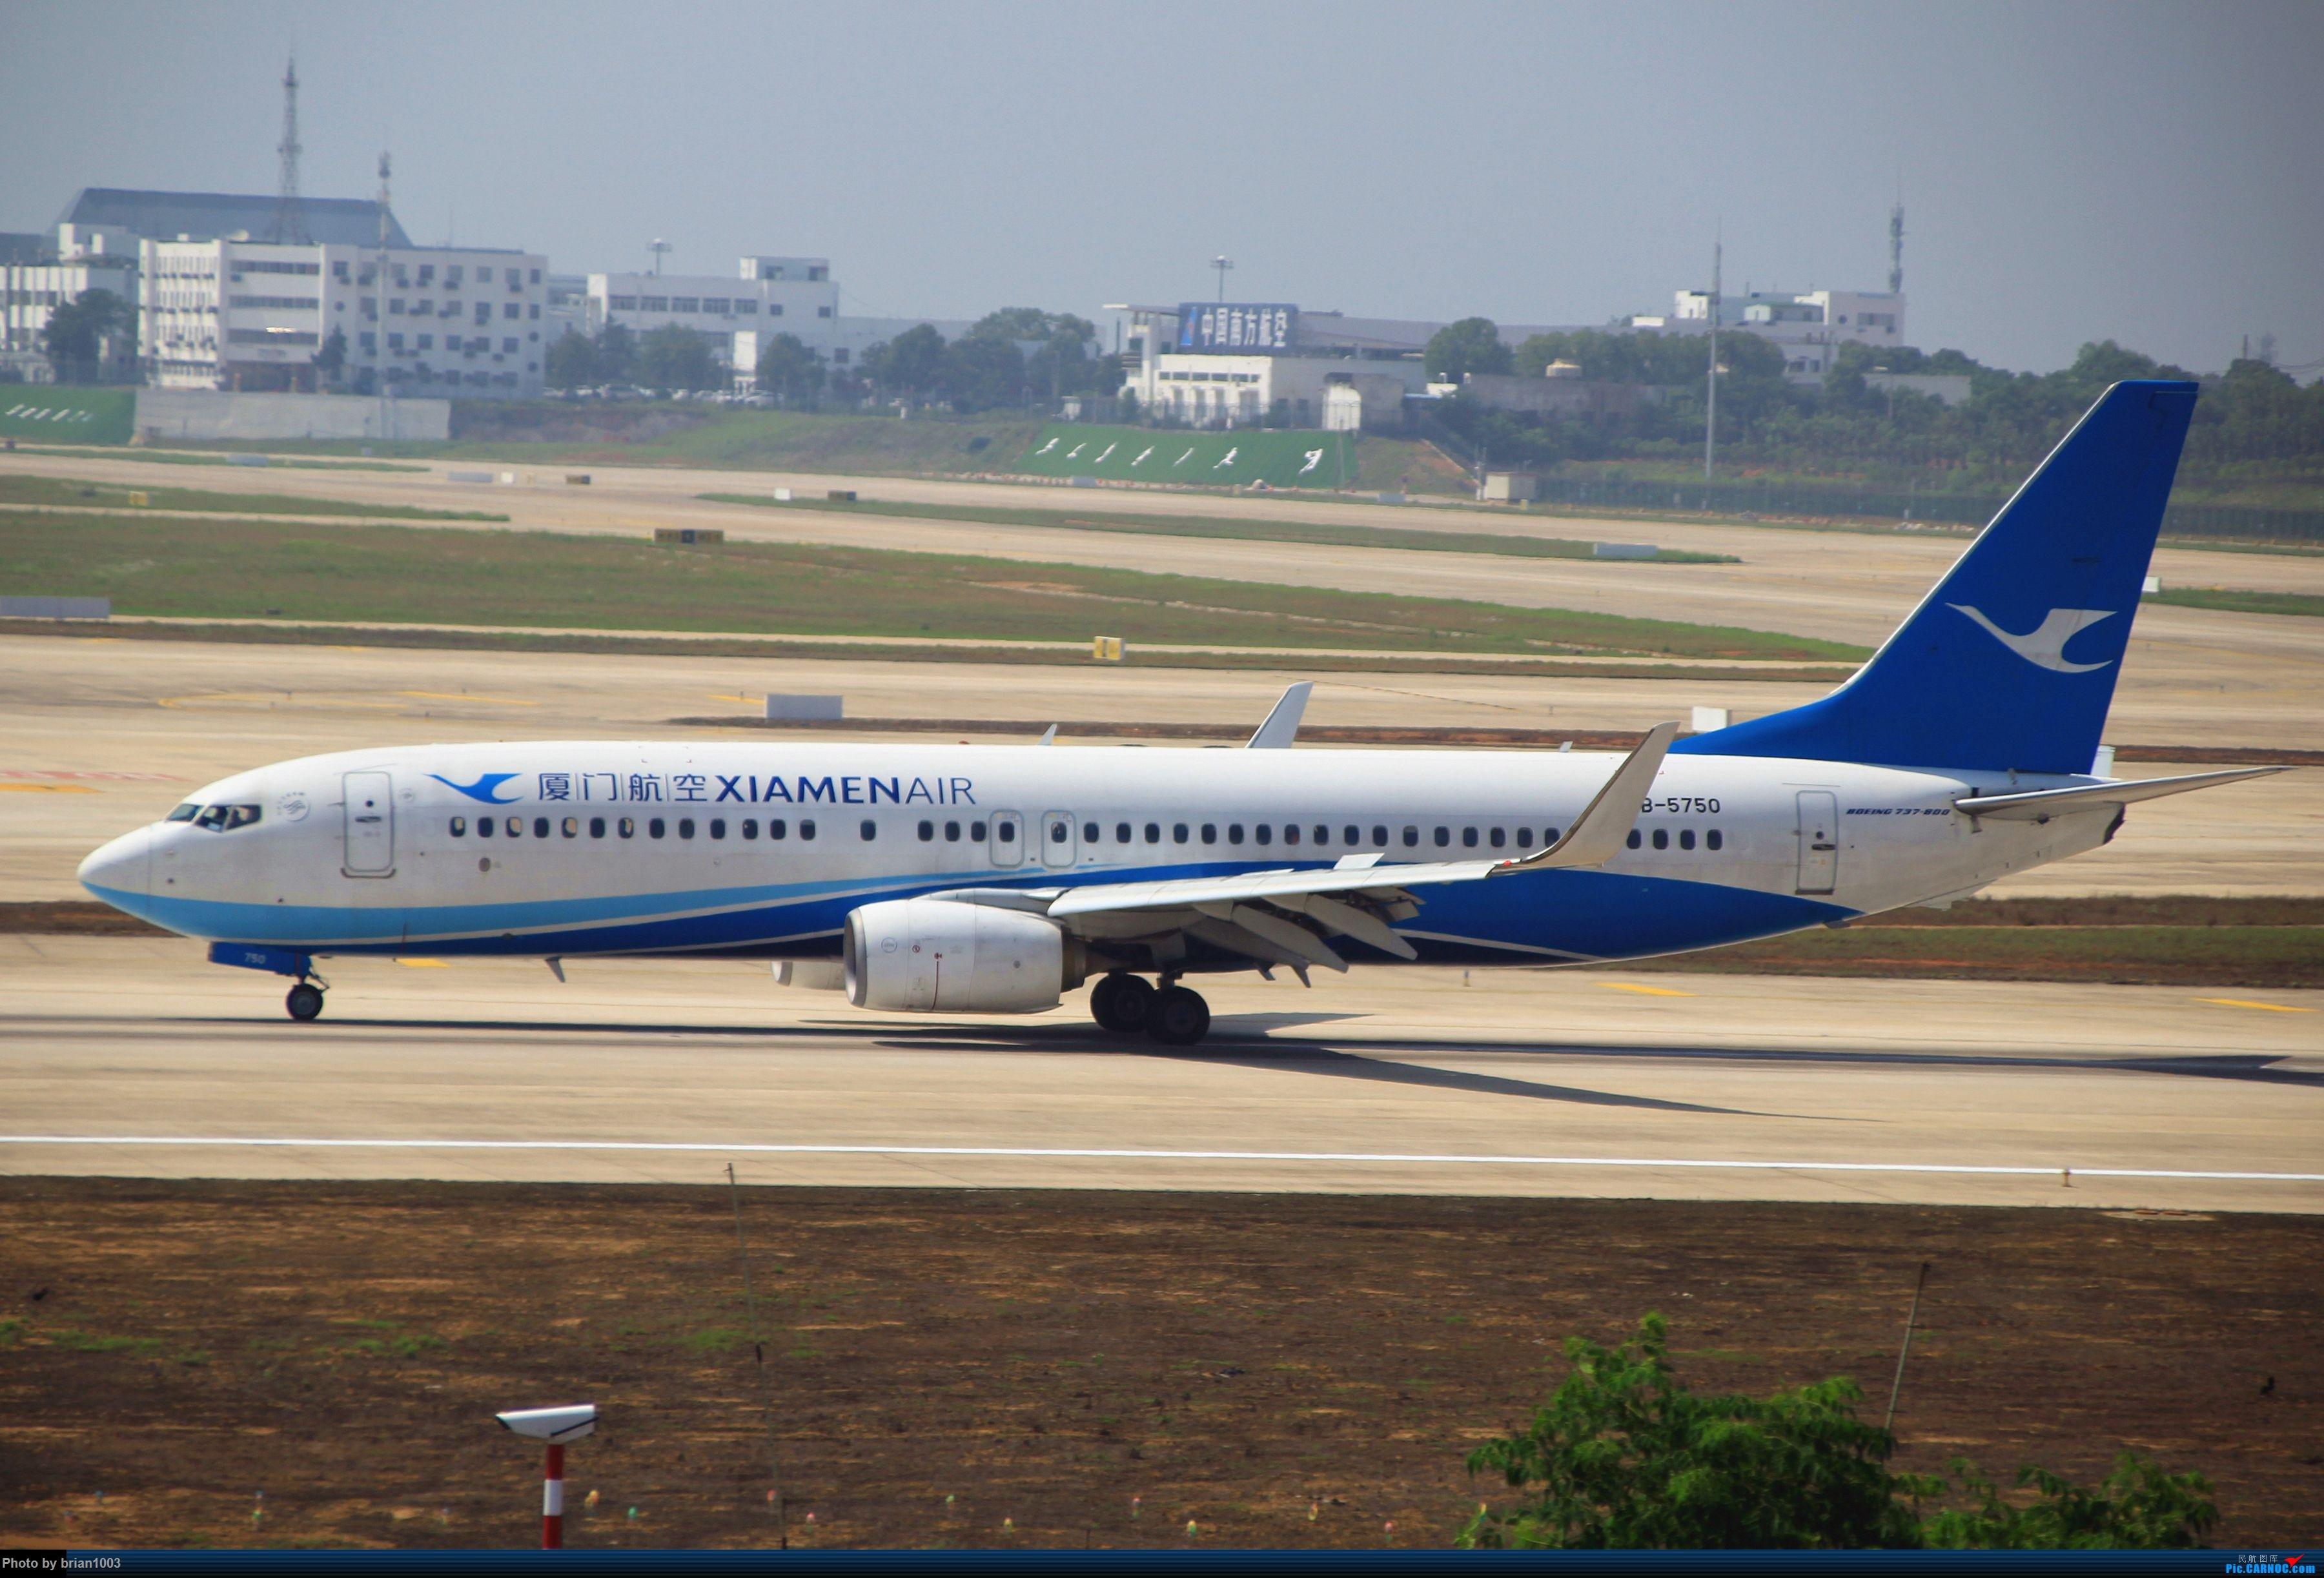 Re:[原创]WUH武汉天河机场拍机之喜迎酷航788和偶遇某其他飞机 BOEING 737-800 B-5750